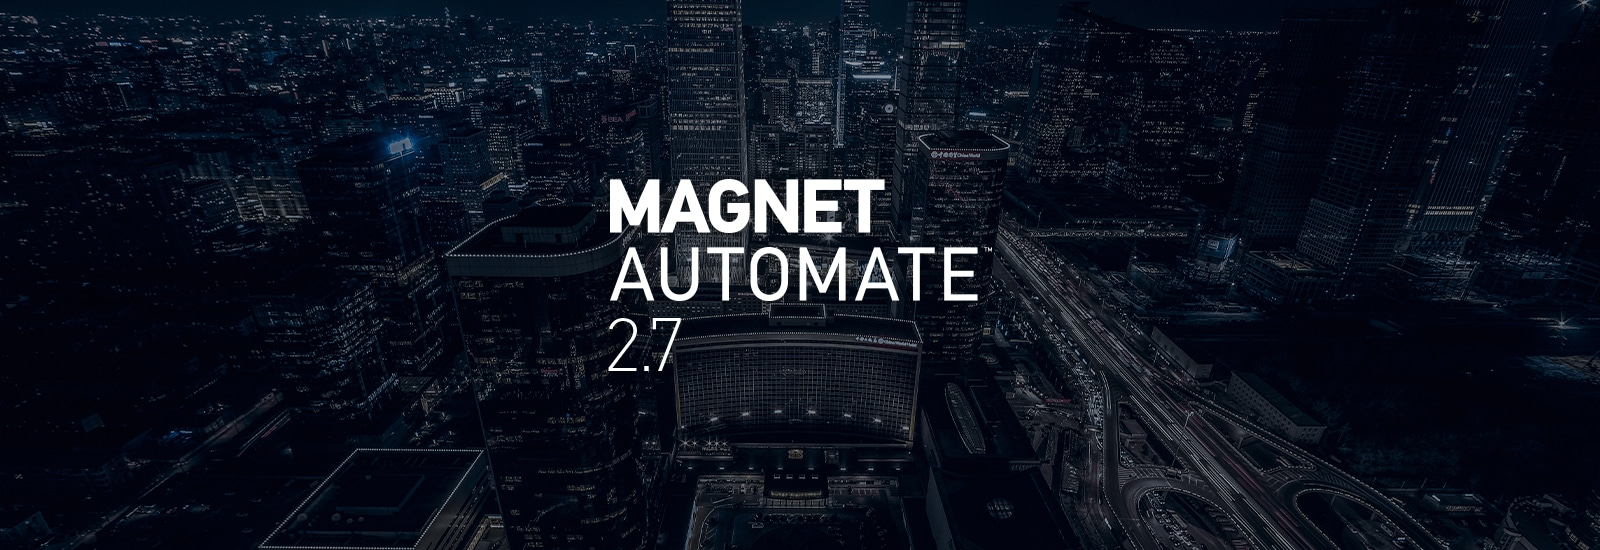 AUTOMATE 2.7